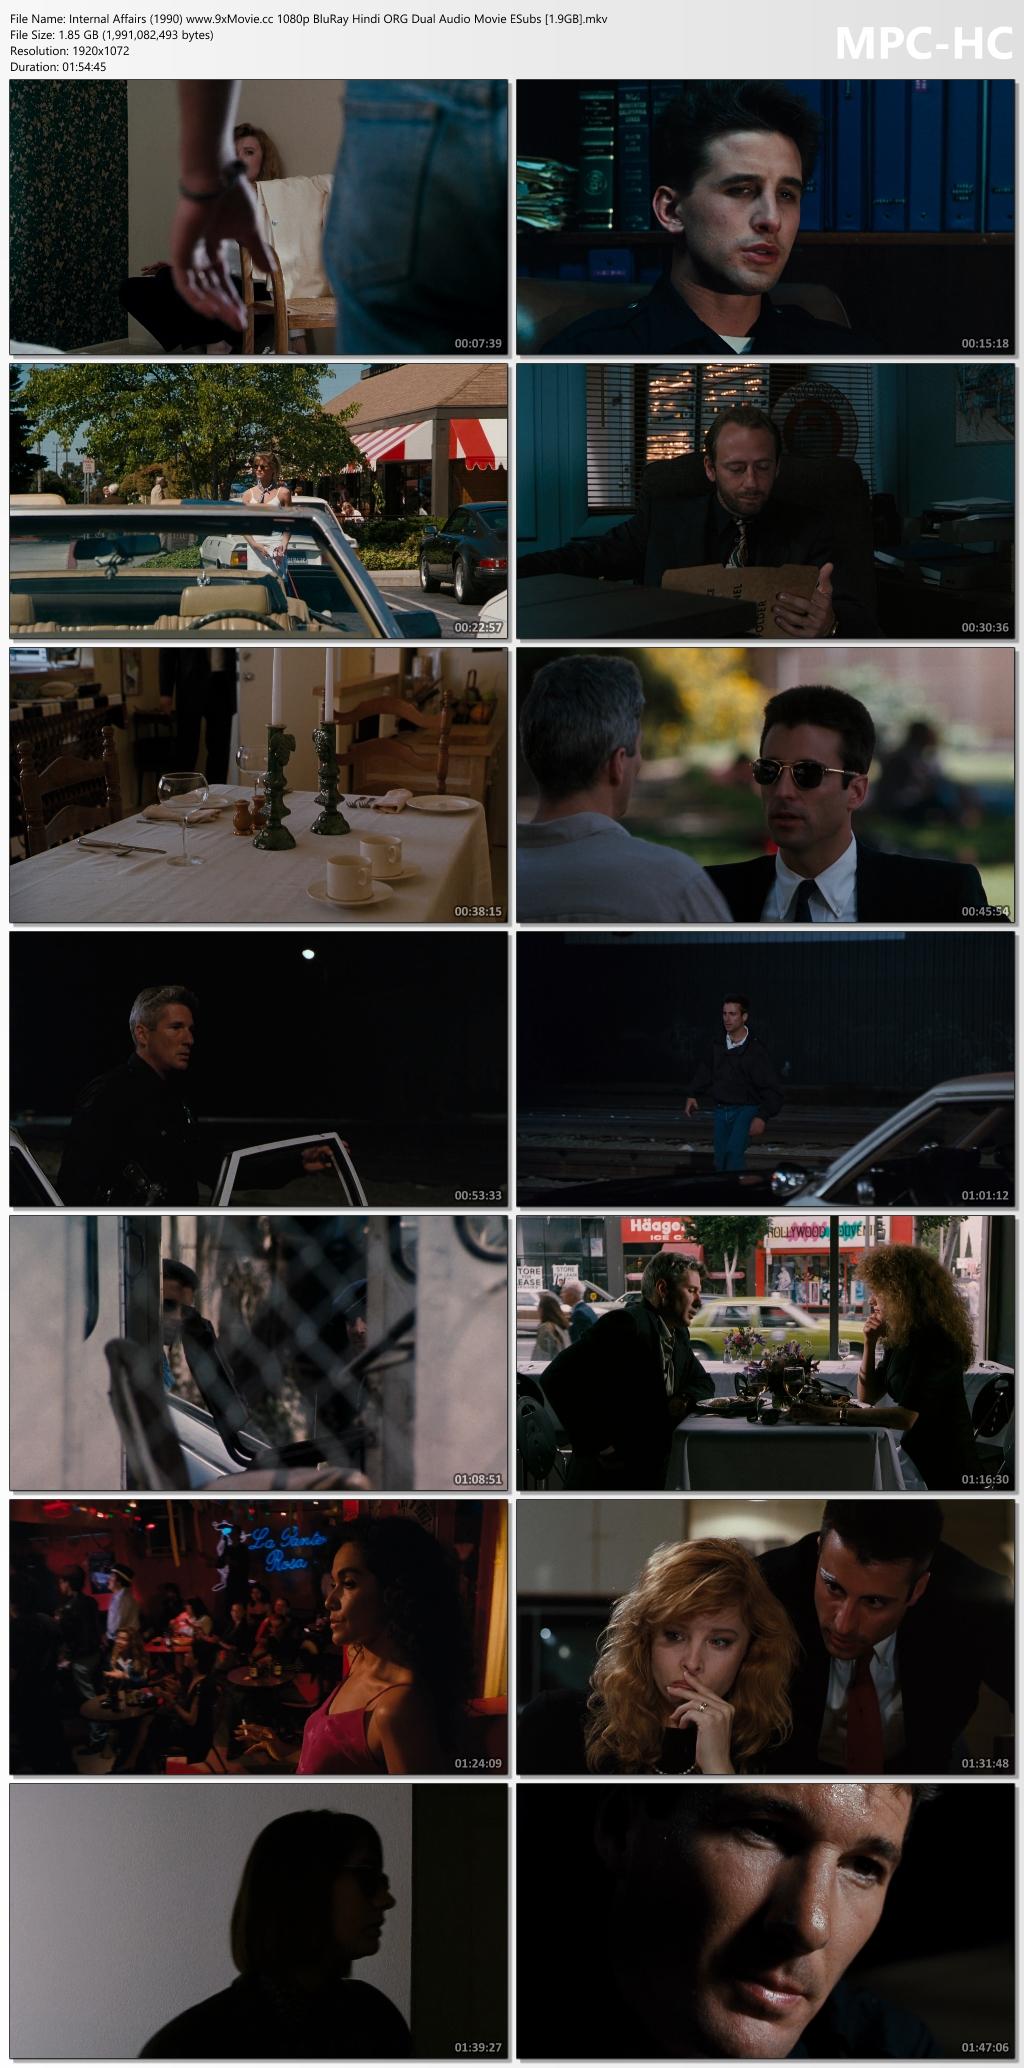 Internal-Affairs-1990-www-9x-Movie-cc-1080p-Blu-Ray-Hindi-ORG-Dual-Audio-Movie-ESubs-1-9-GB-mkv